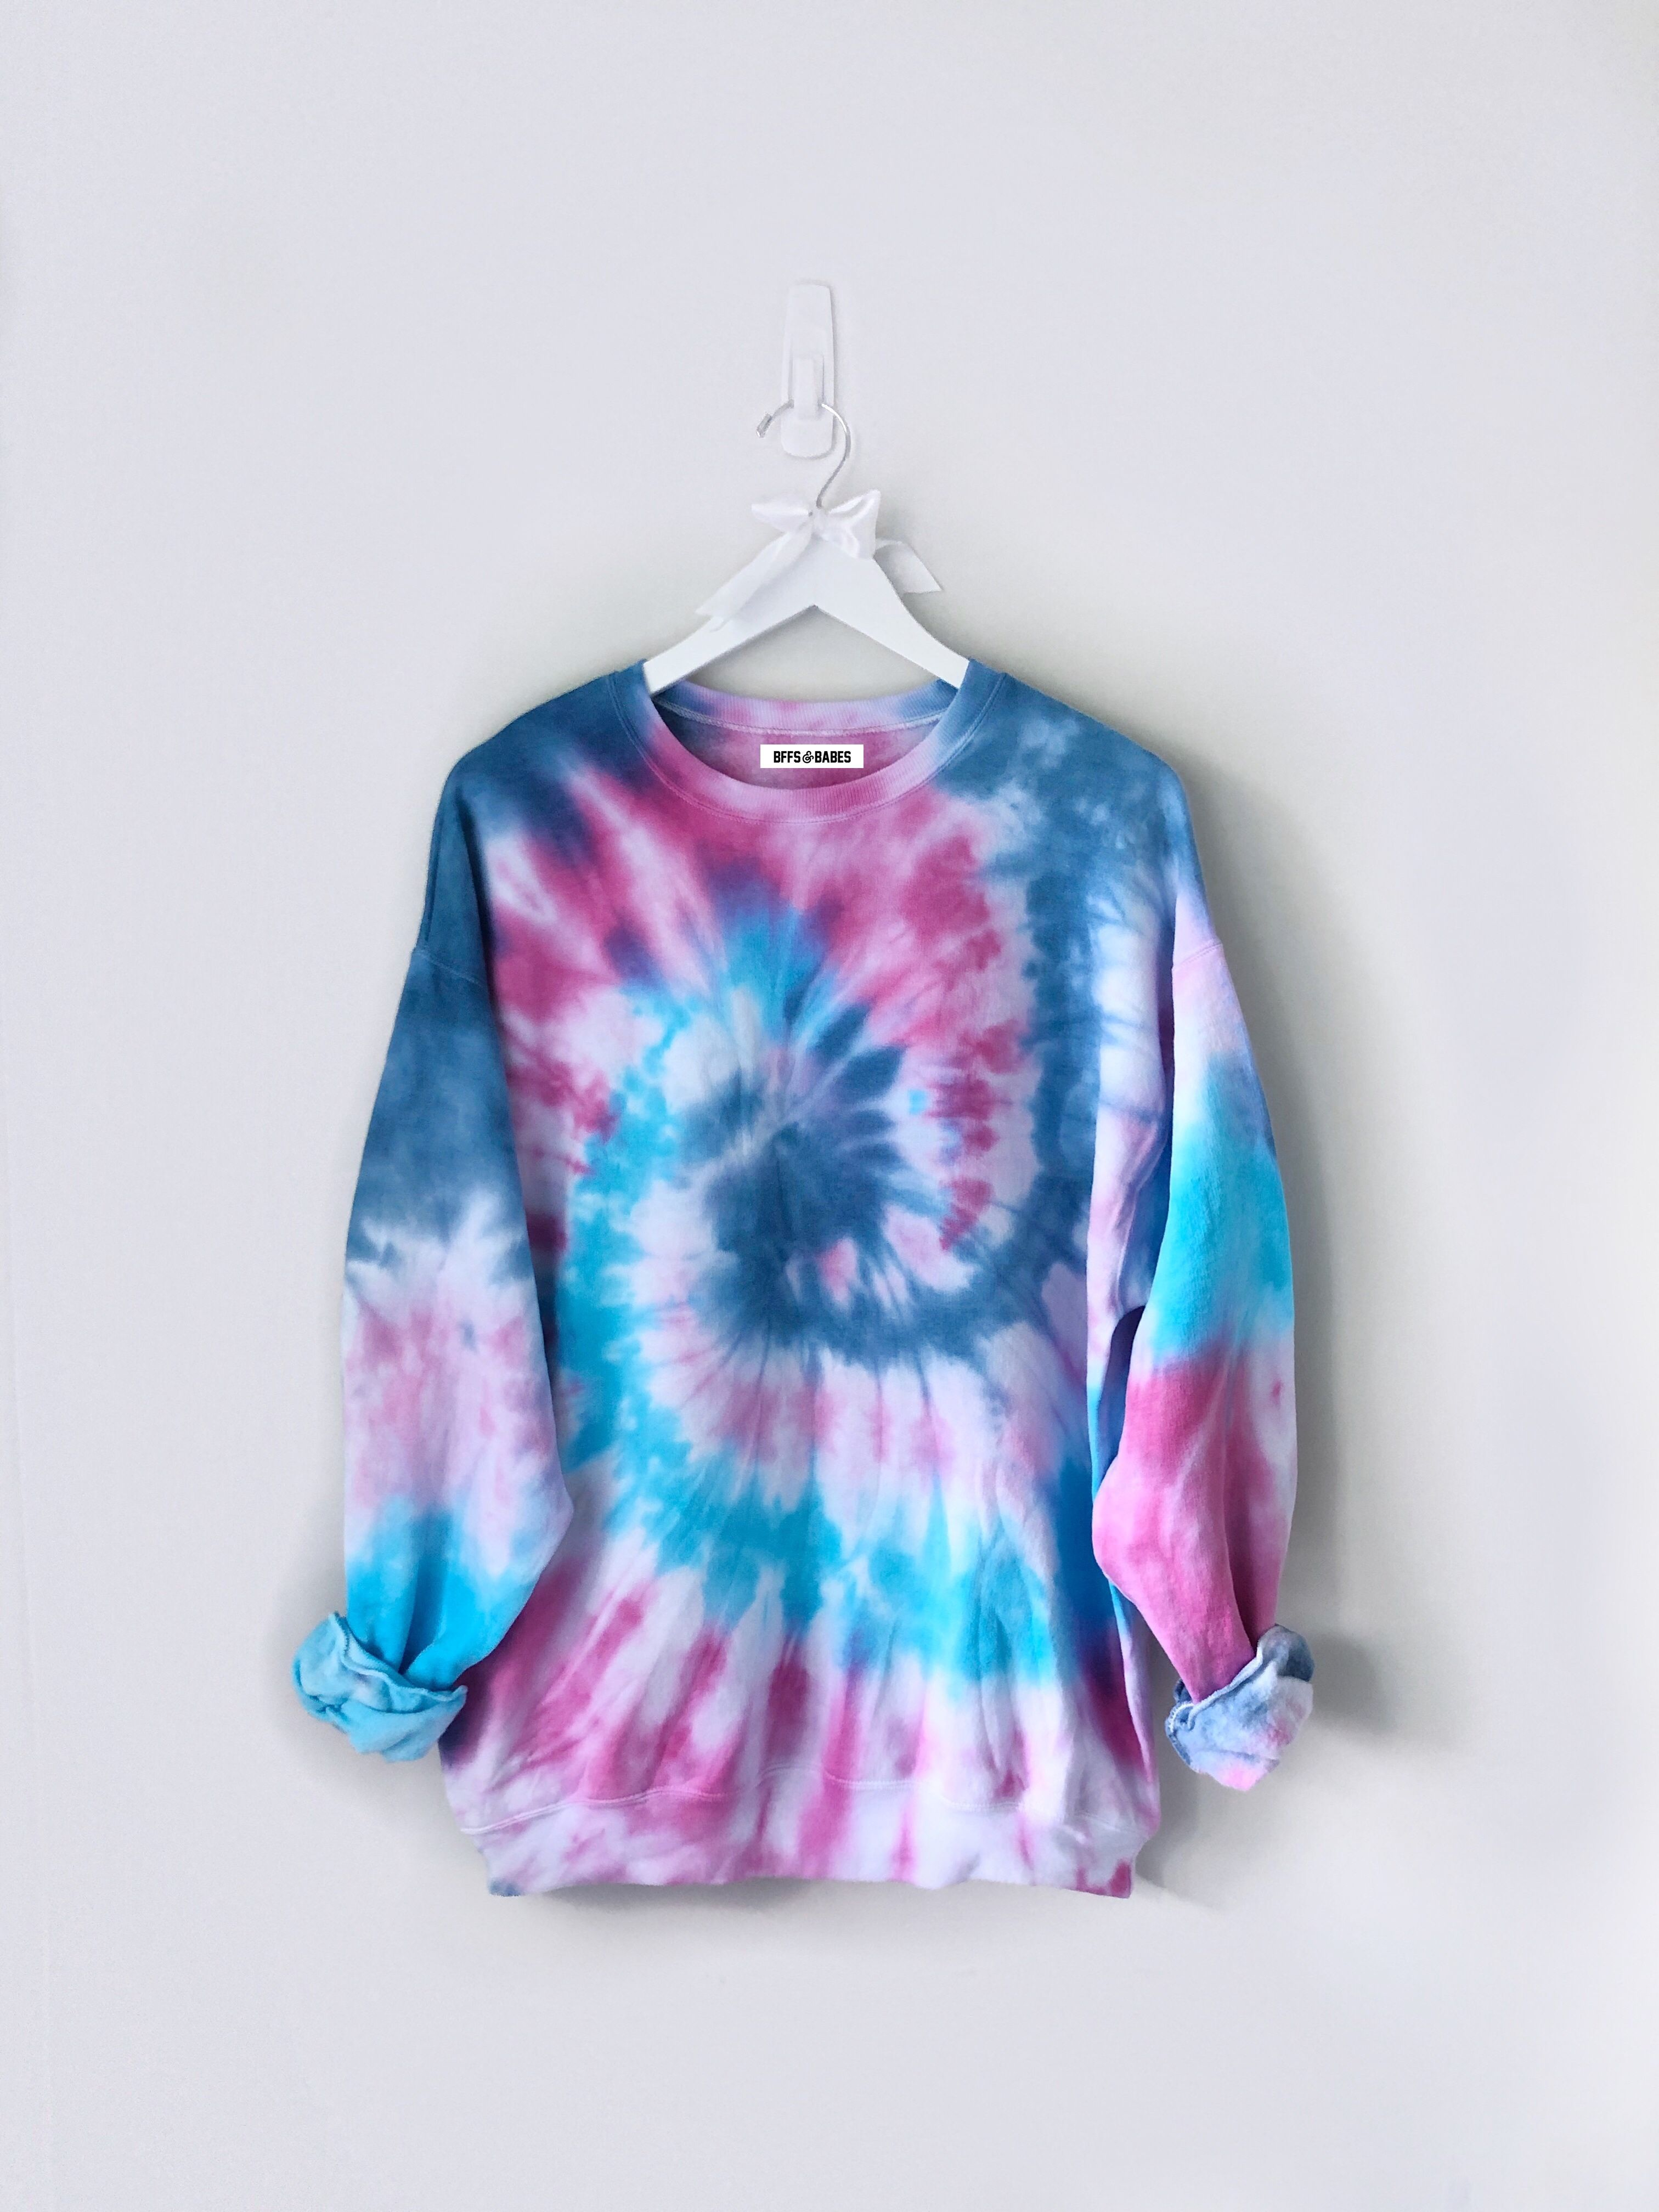 Shades Of Blue And Shades Of Pink Tie Dye Pullover Sweatshirt Tye Dye Shirts Tie Dye Outfits Tie Dye Fashion [ 4032 x 3024 Pixel ]